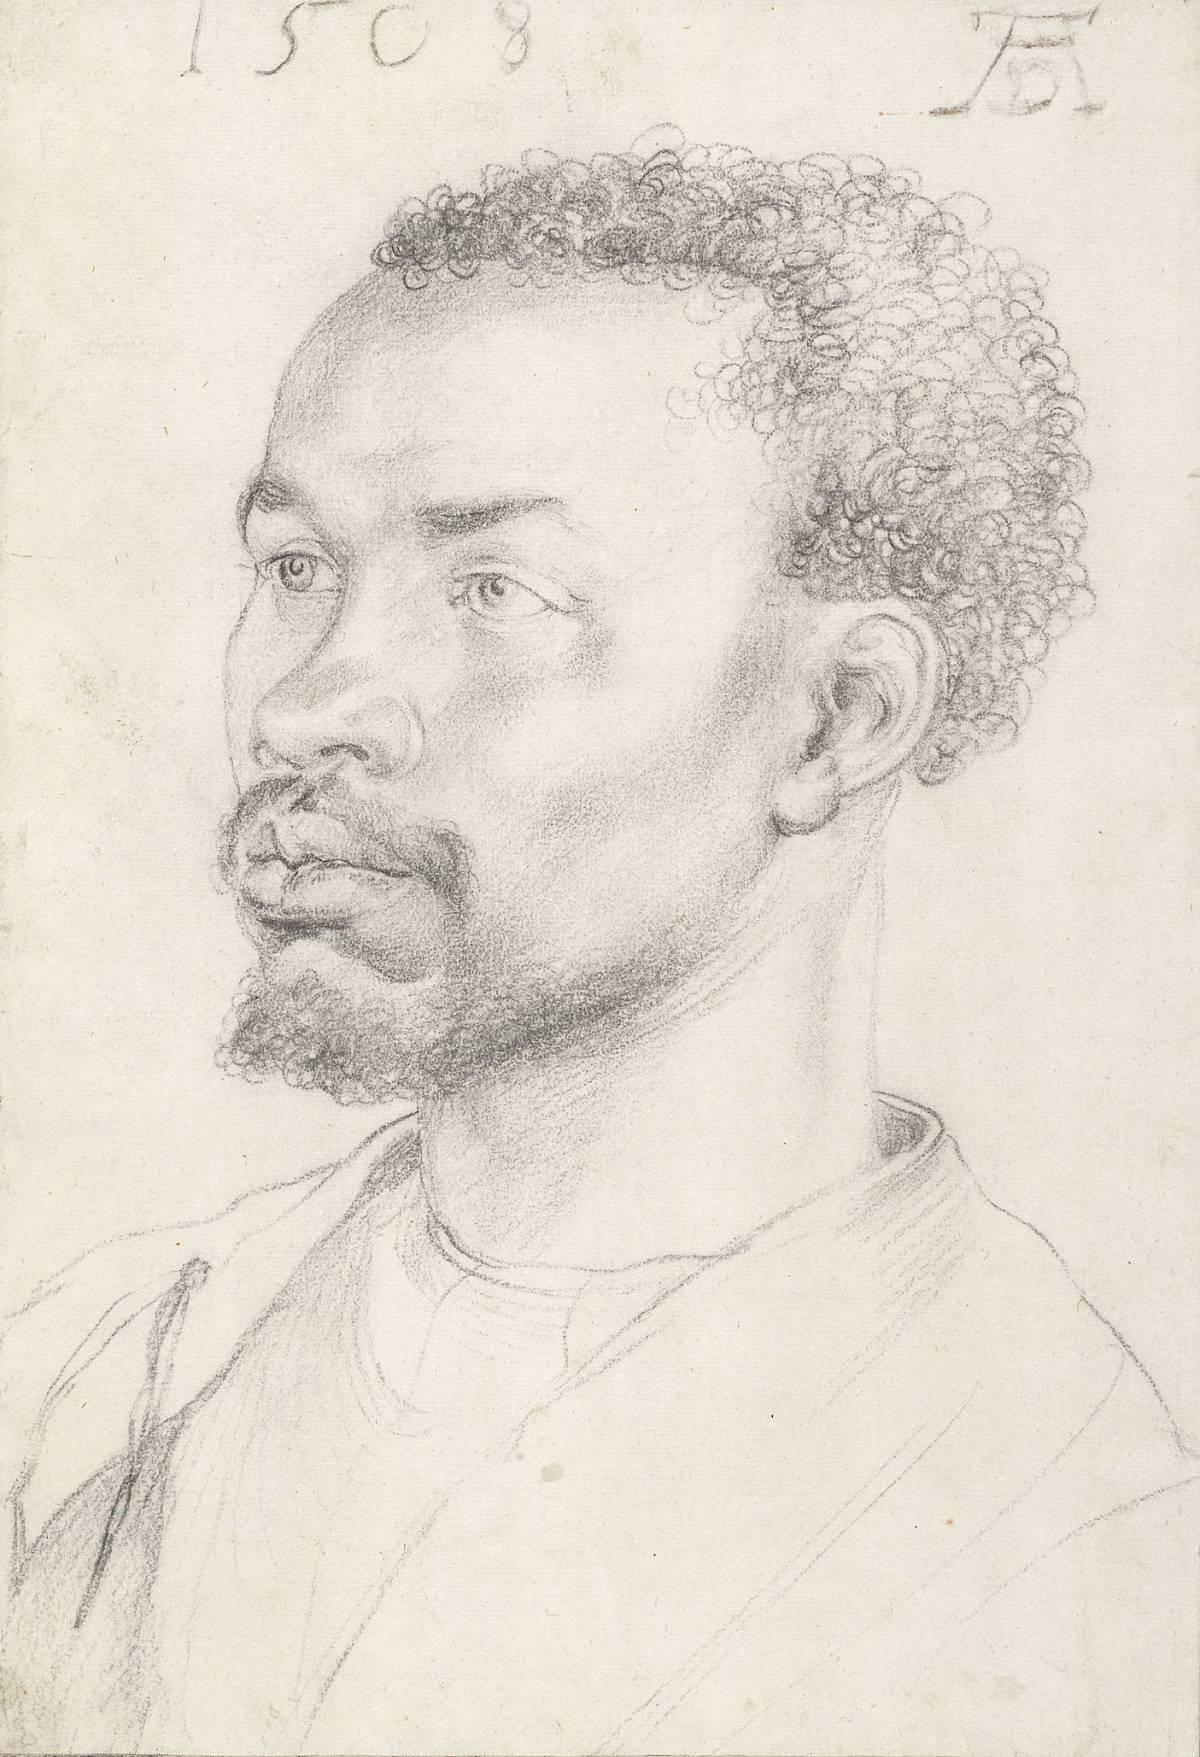 Albrecht Dürer: Ritratto di un uomo africano, 1508